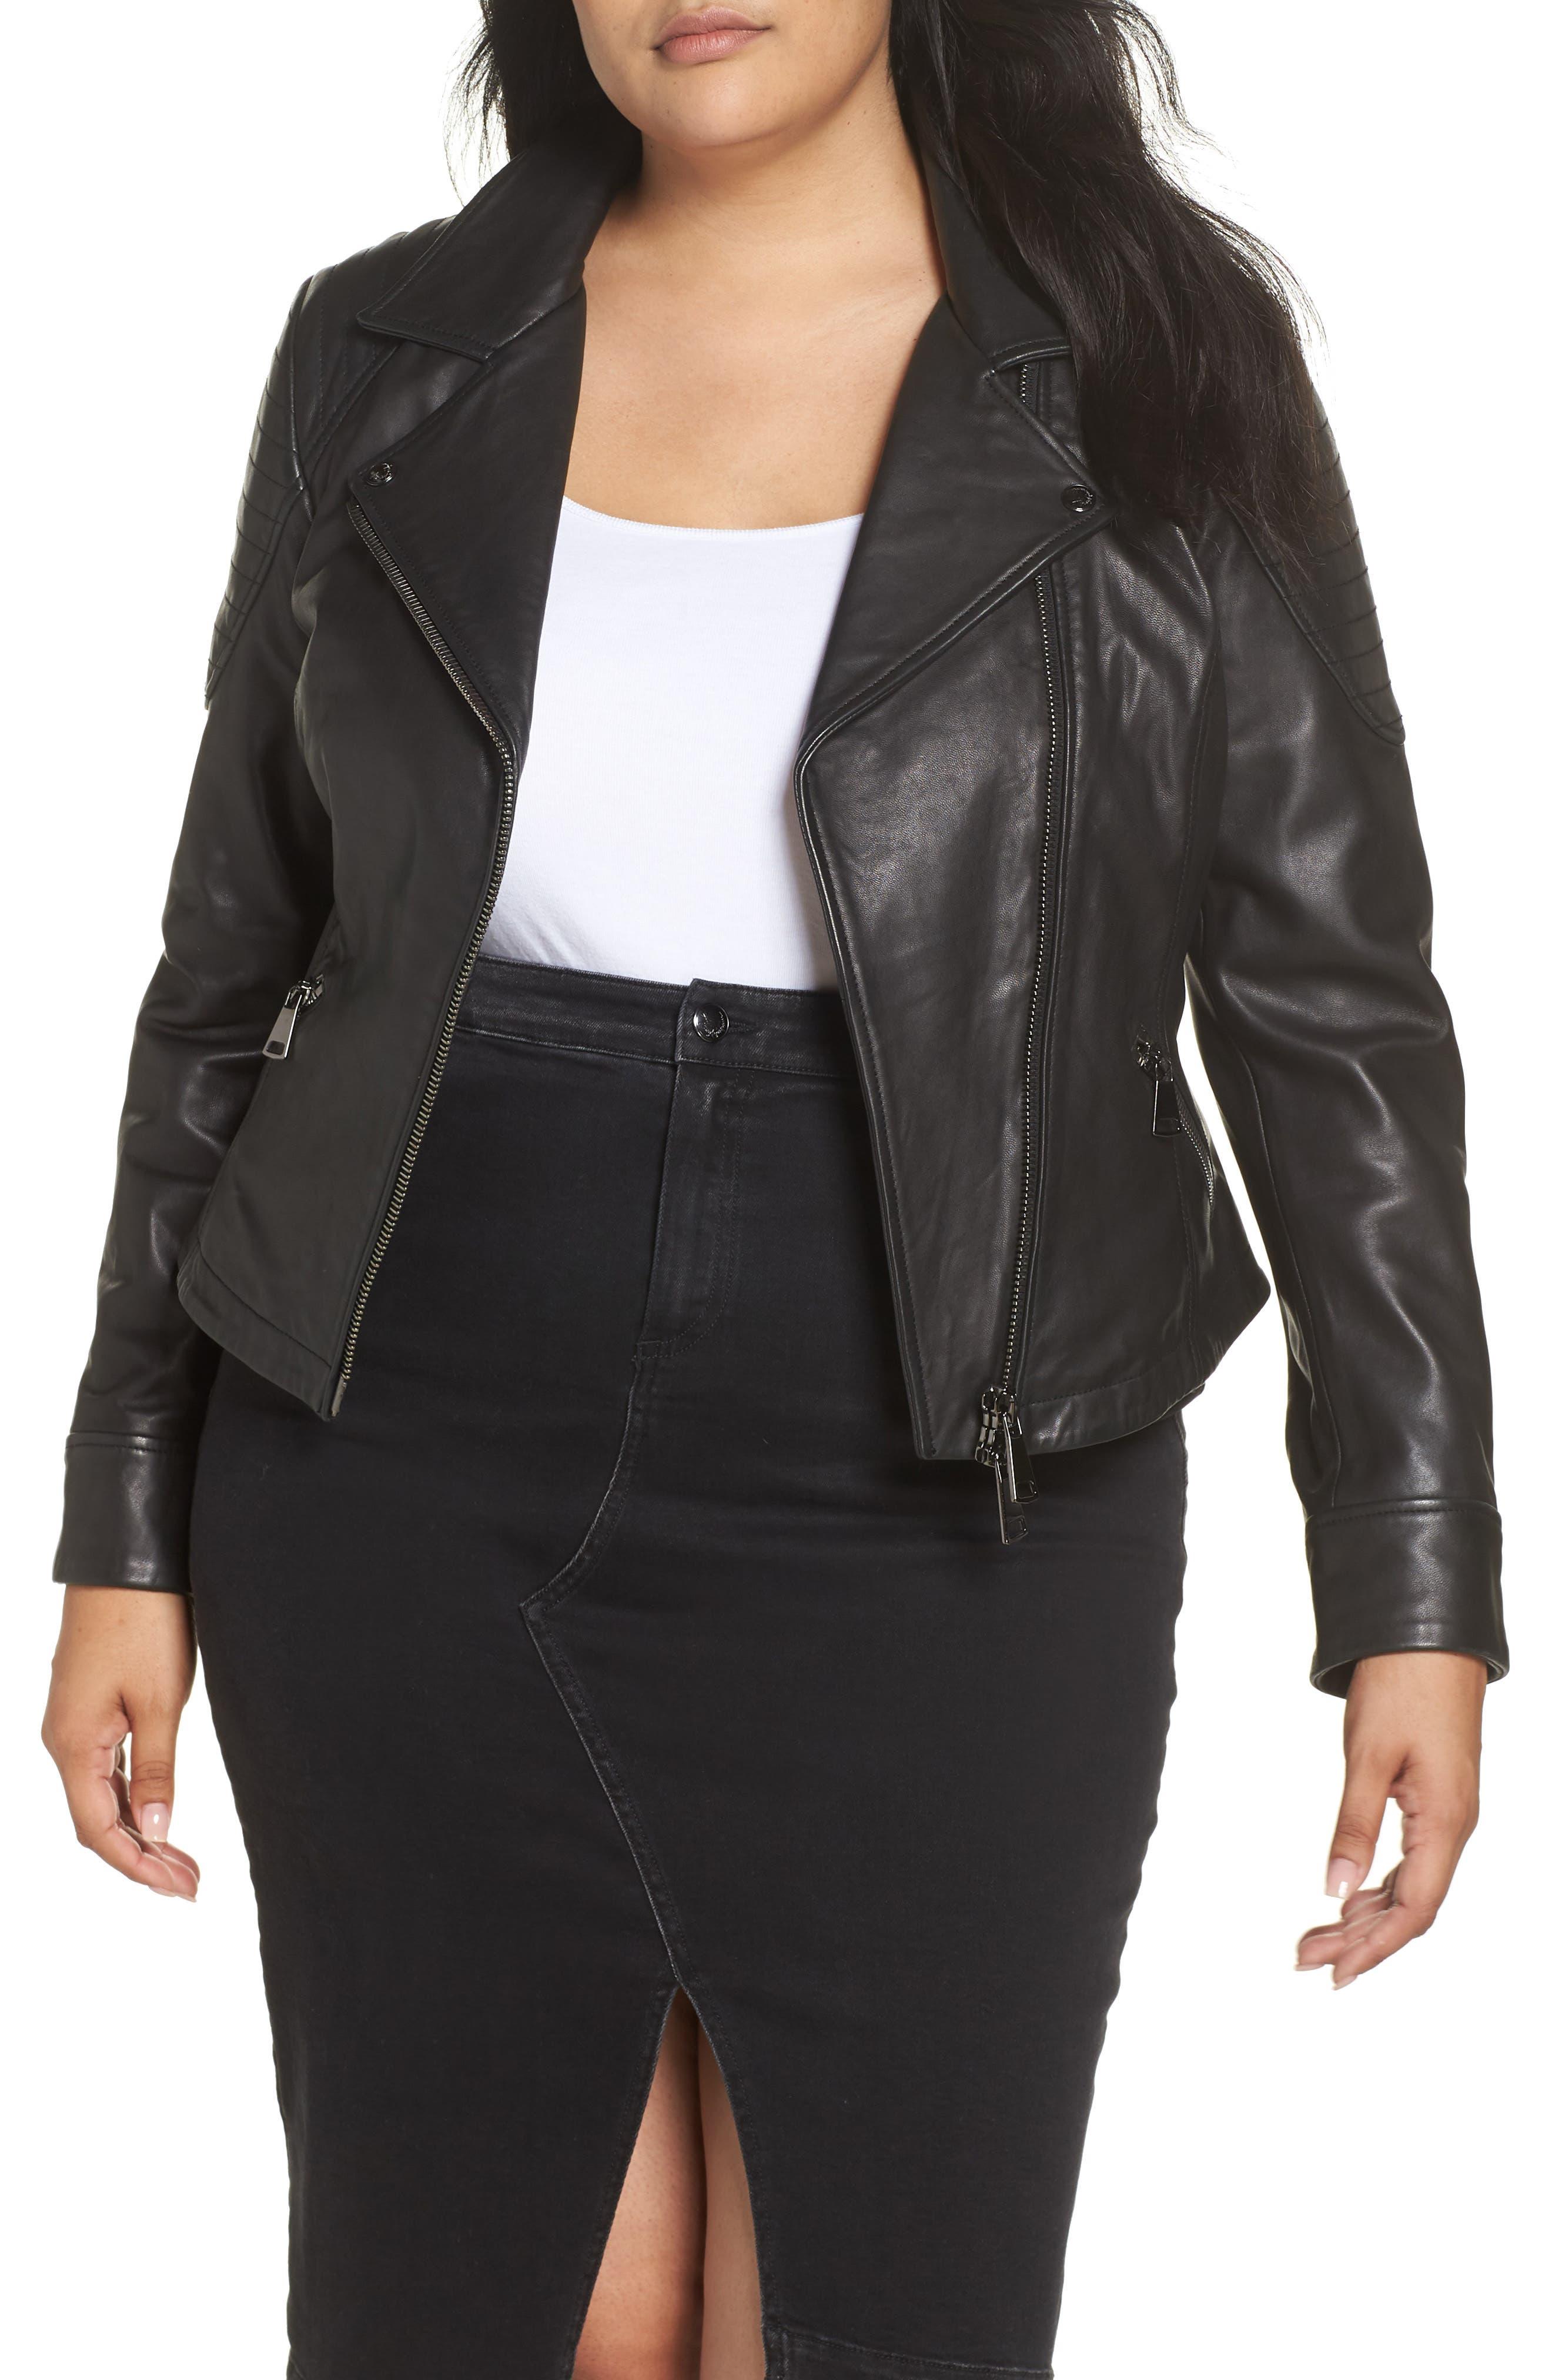 ASHLEY GRAHAM X MARINA RINALDI Ebe Leather Biker Jacket in Black 2